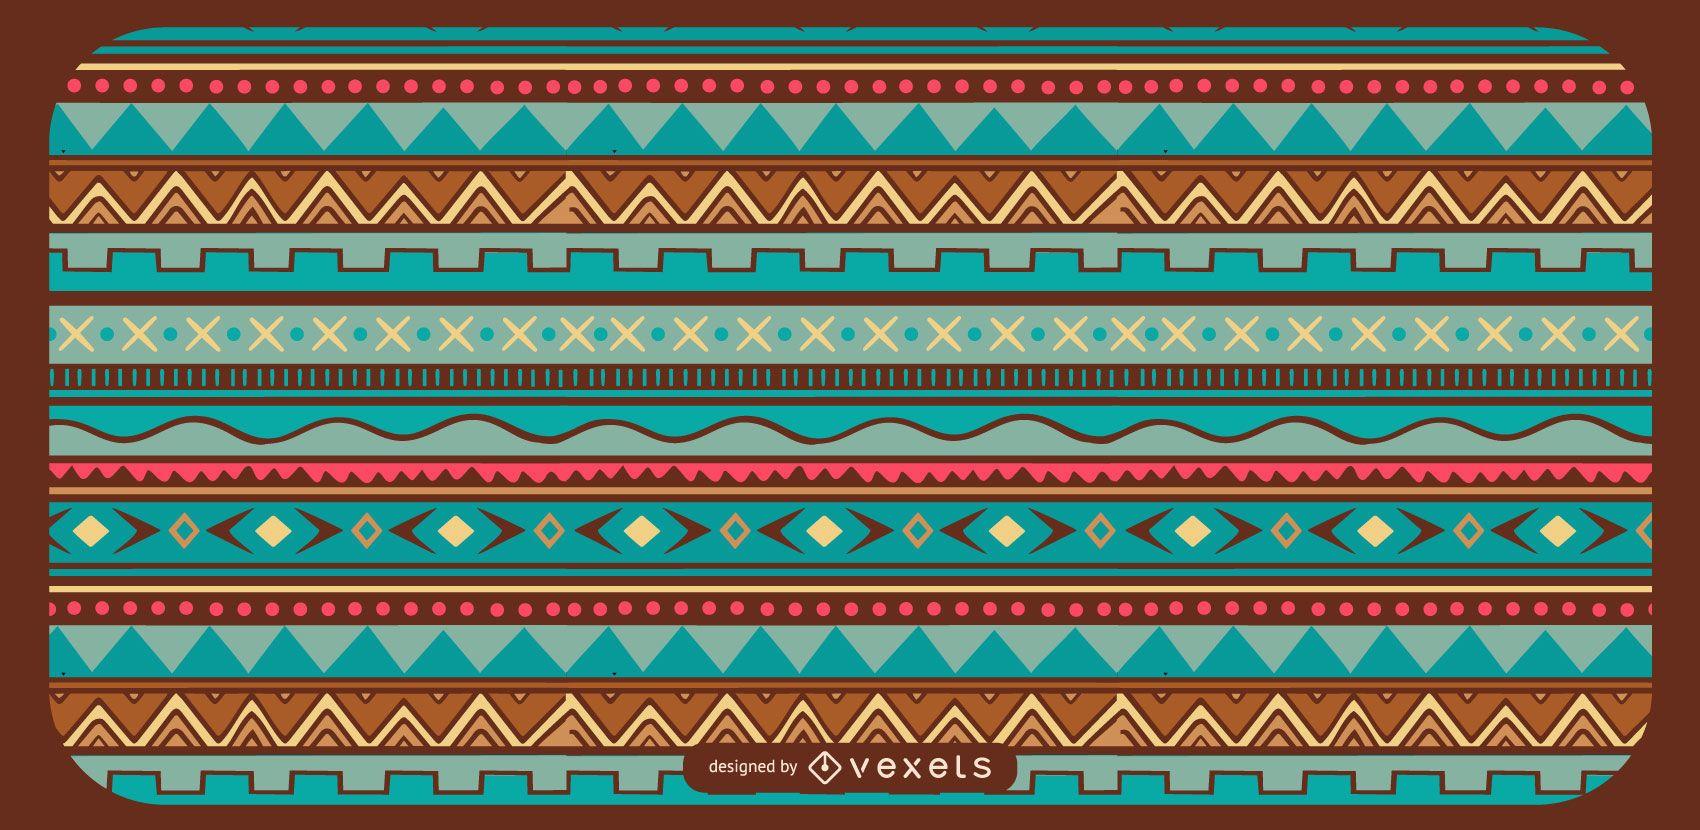 Geometrical Aztec Pattern Design